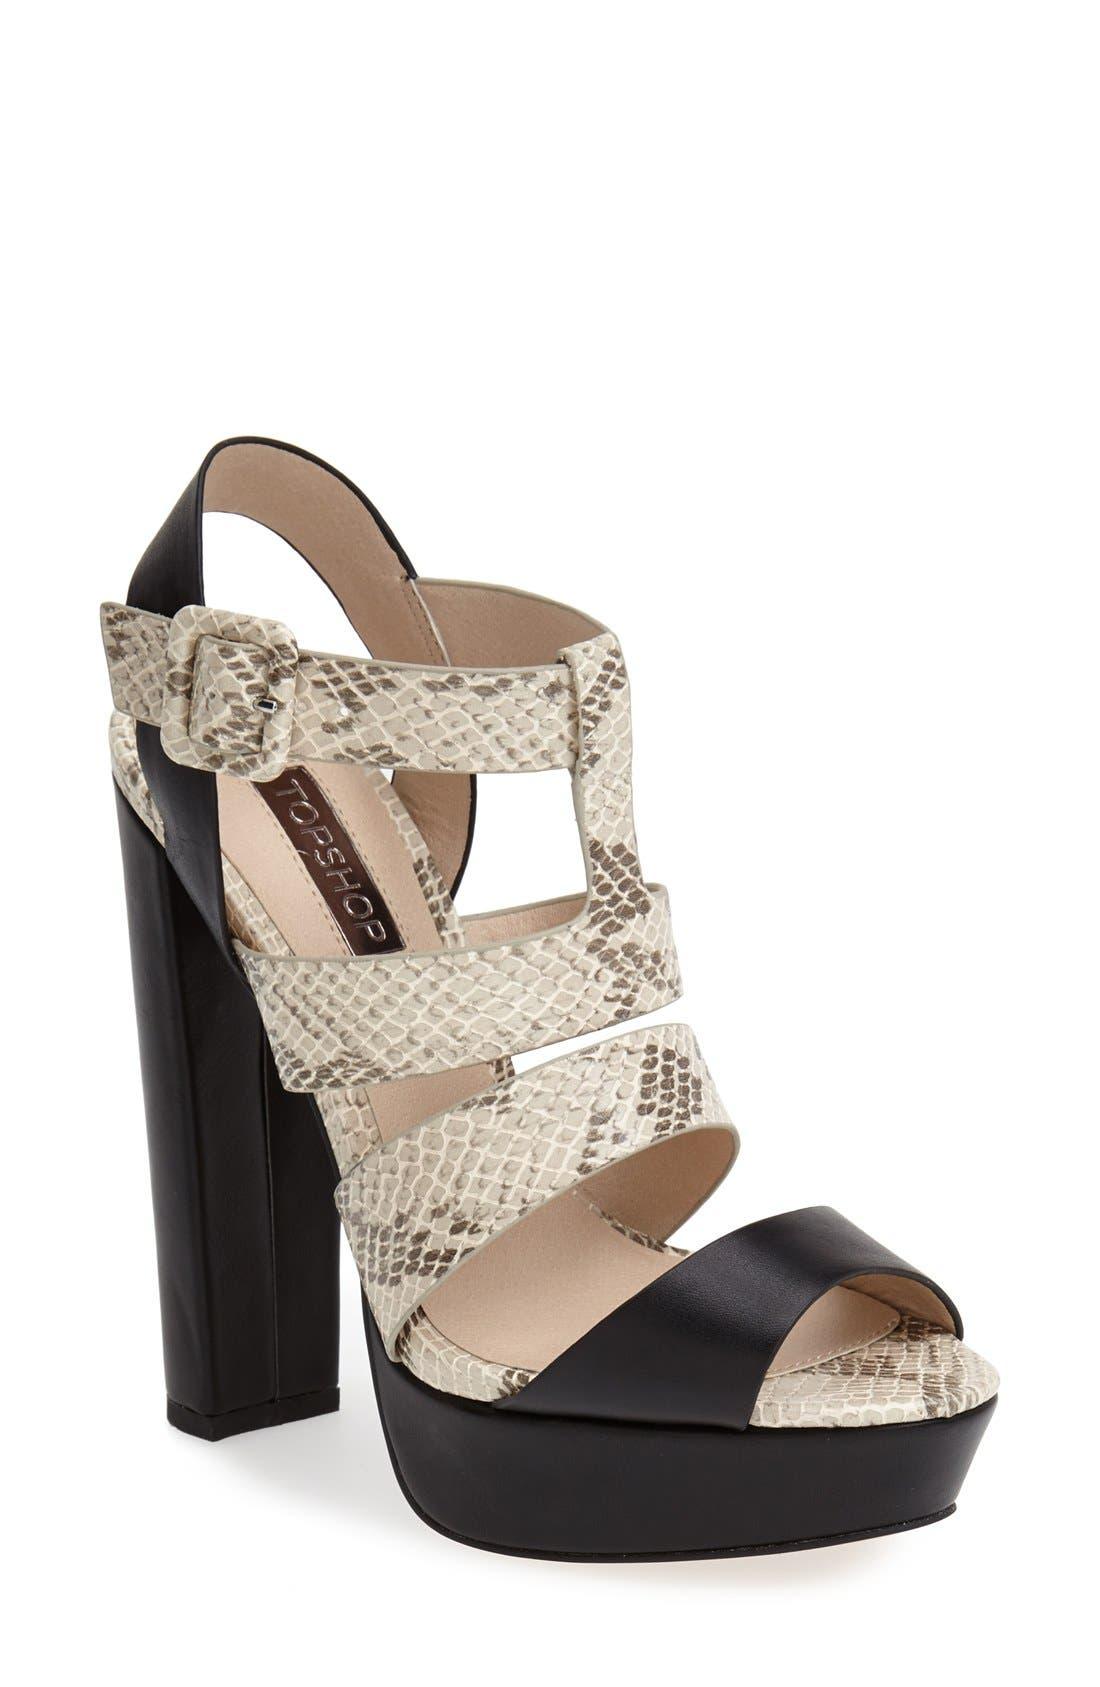 Main Image - Topshop 'Lucy' Gladiator Sandal (Women)